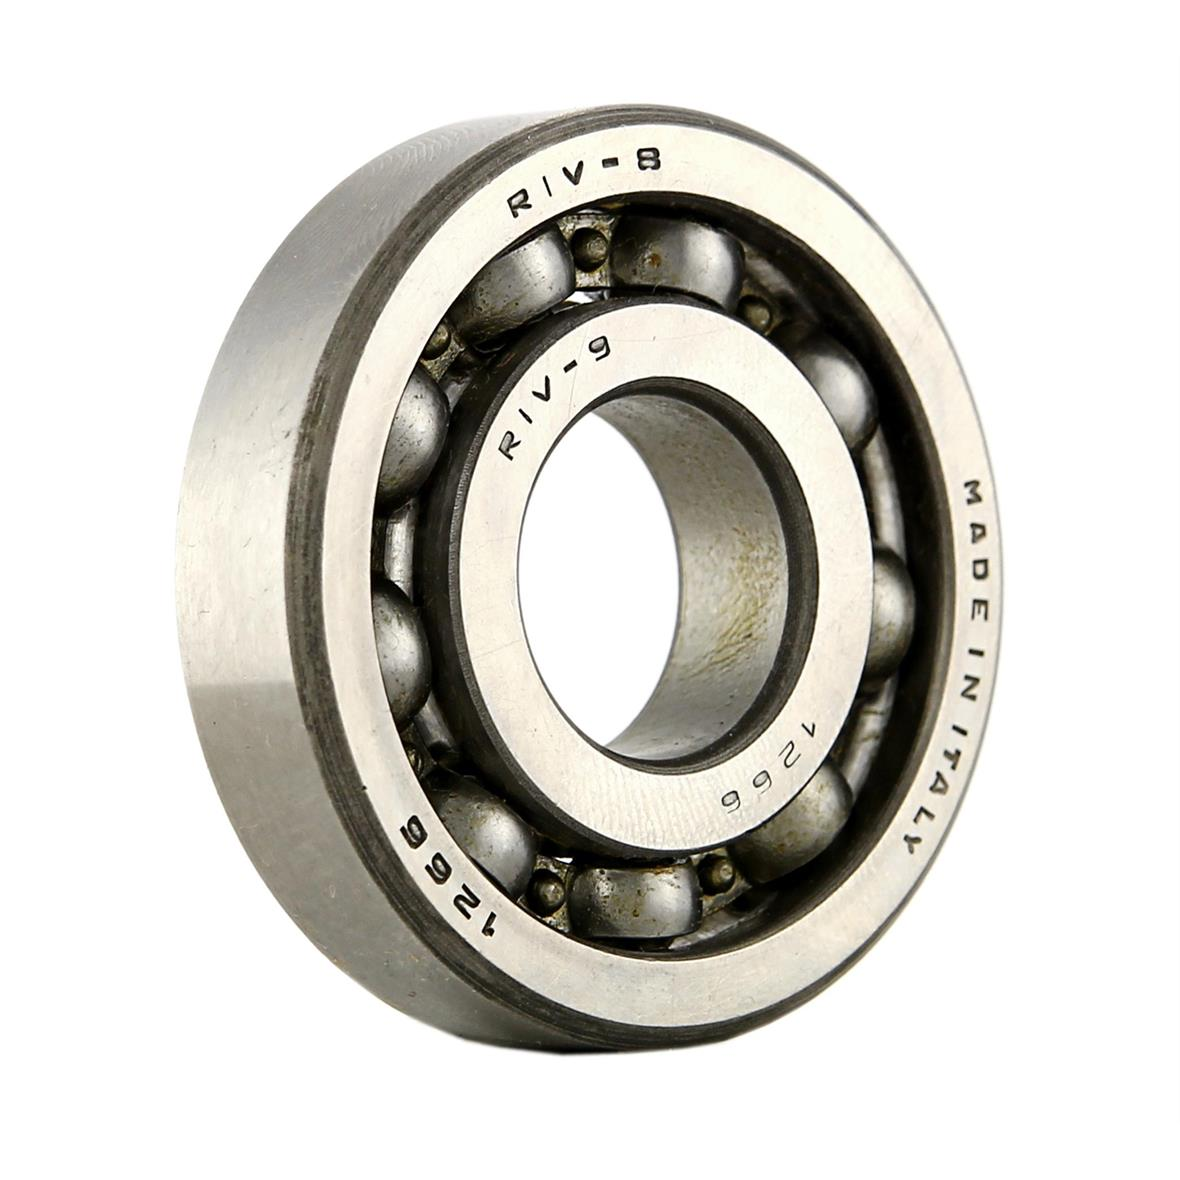 Product Image for 'Bearing Crankshaft 25x56x12; 20x52x12 mmTitle'